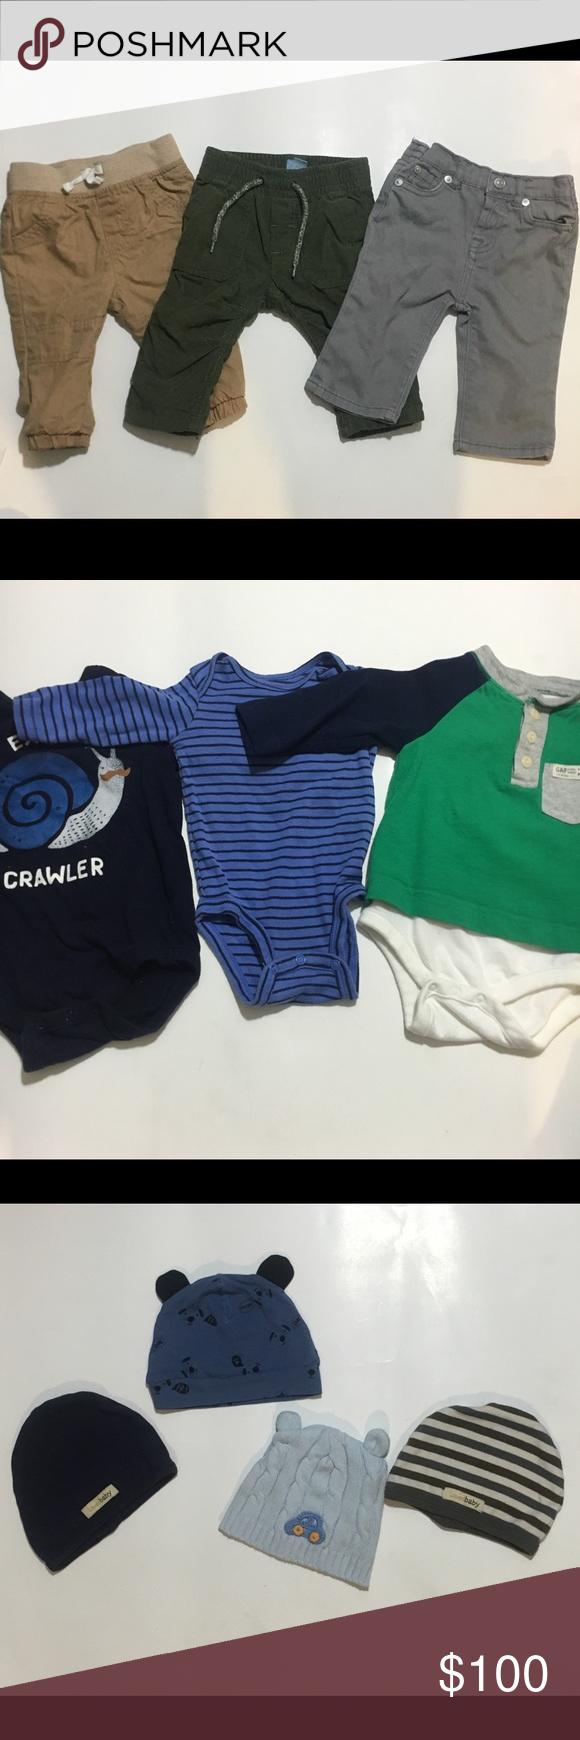 57aaa5096109 Winter baby boy bundle Baby winter bundle all 3-6 months 3 pair of ...